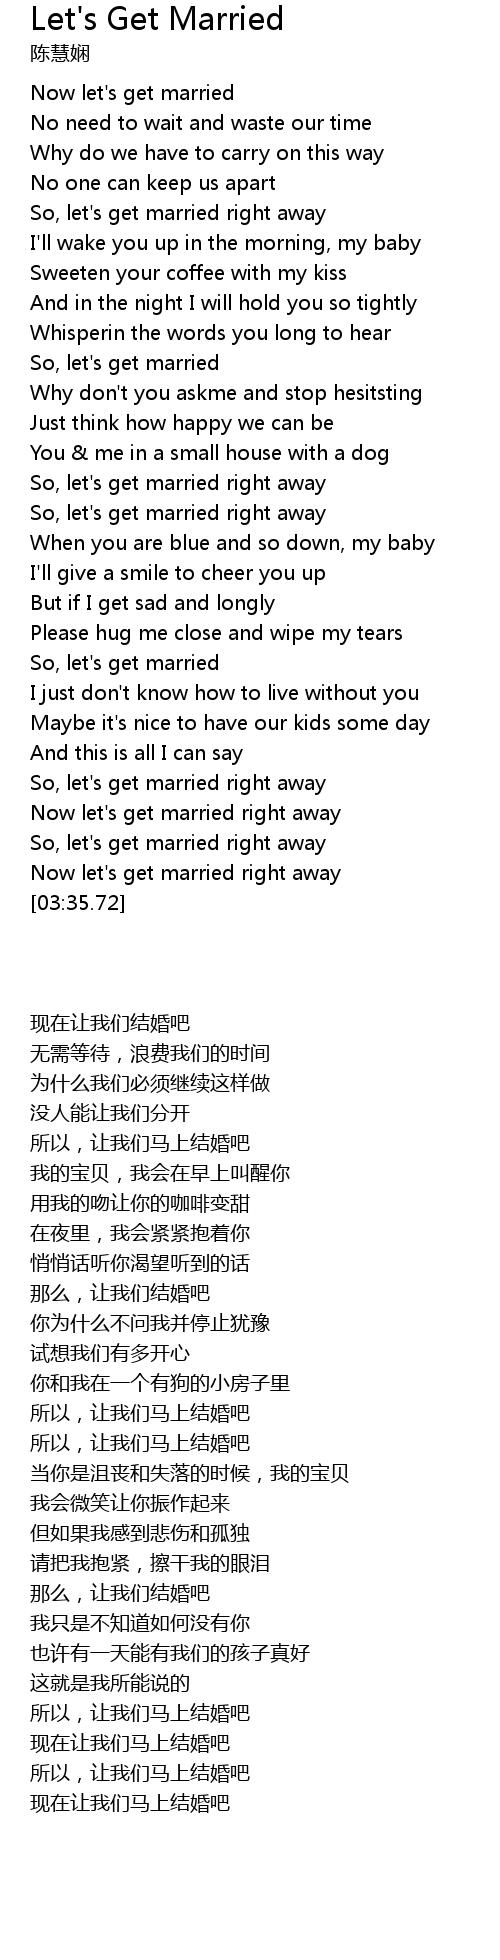 Let S Get Married Lyrics Follow Lyrics